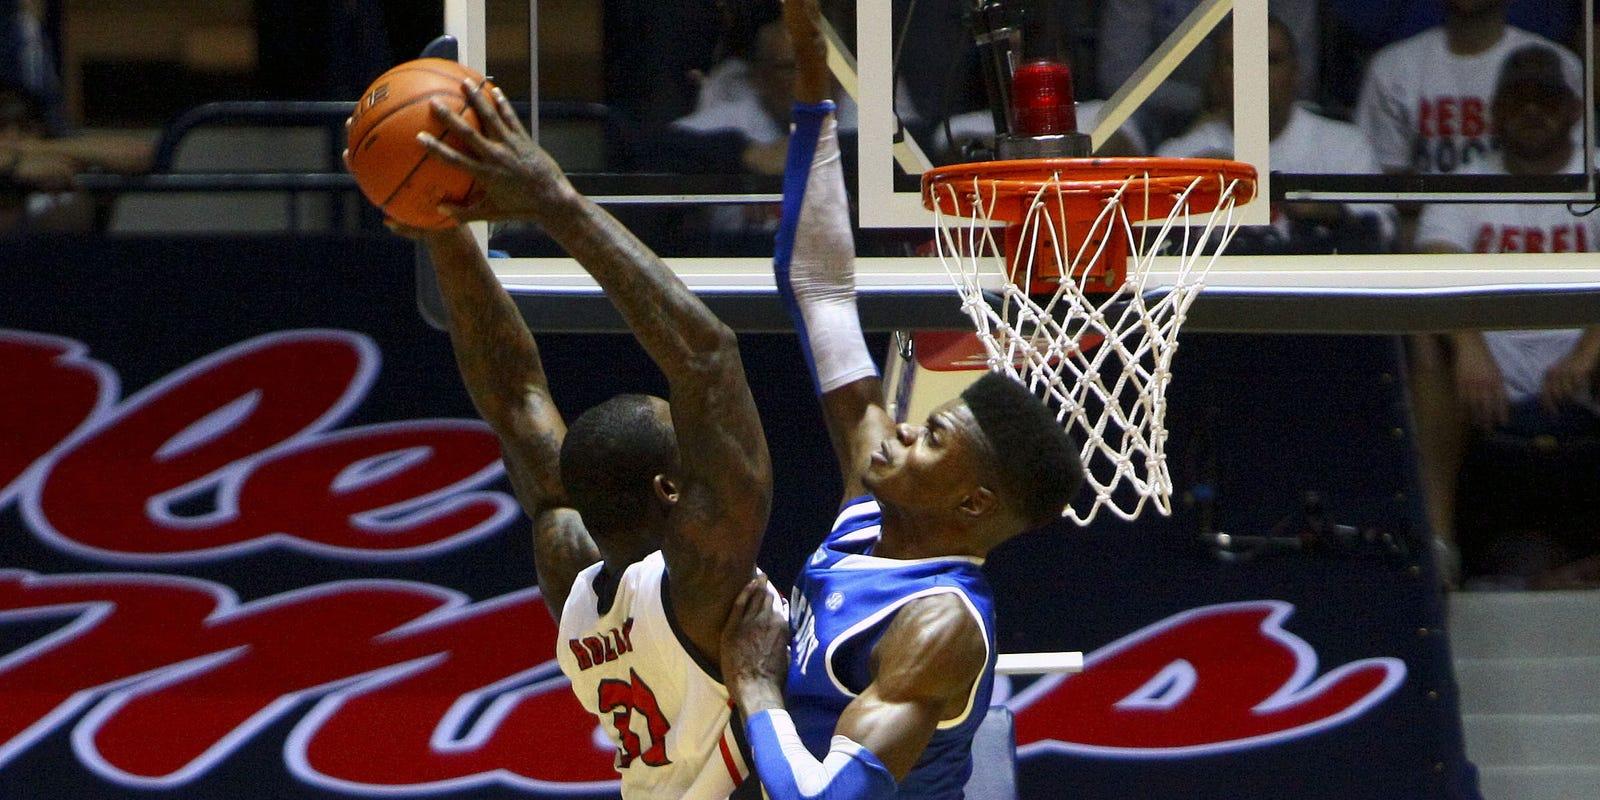 College Basketball Can Anyone Beat The Kentucky Wildcats: Nerlens Noel Has 12 Blocks As Kentucky Wildcats Beat Ole